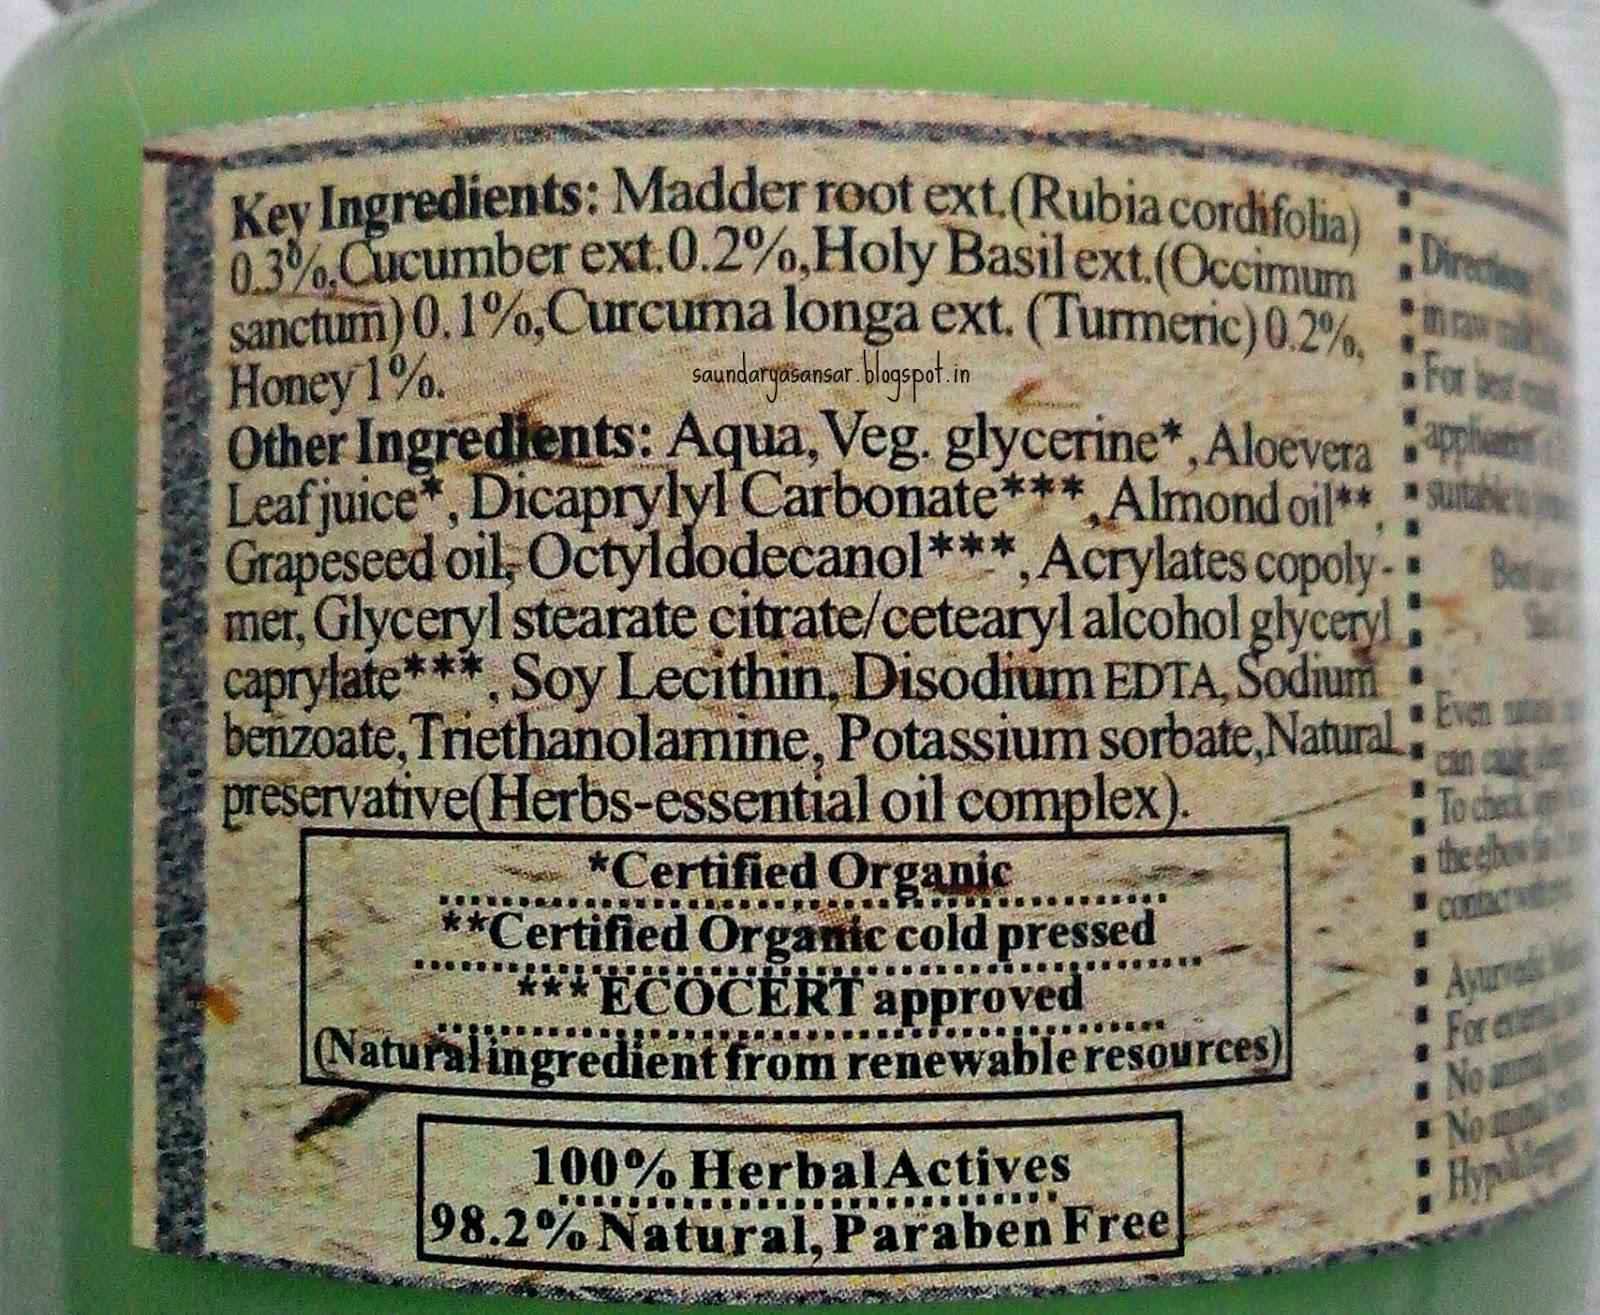 Just-Herbs-Fagel-Instant-Glow-Beauty-Gel-Review